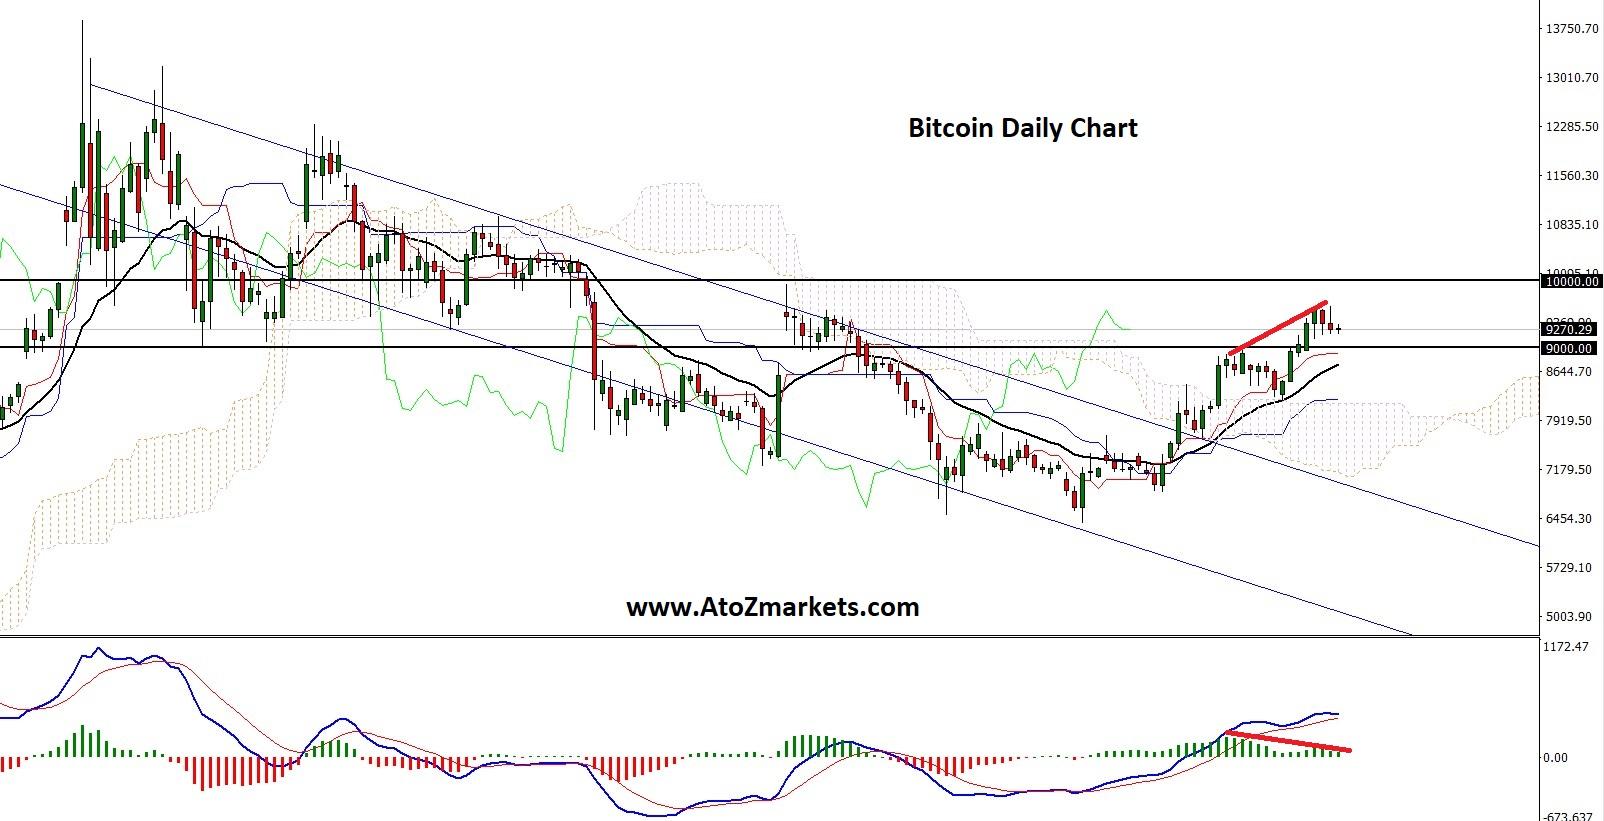 Bitcoin may Continue the Bullish rally After a Correction